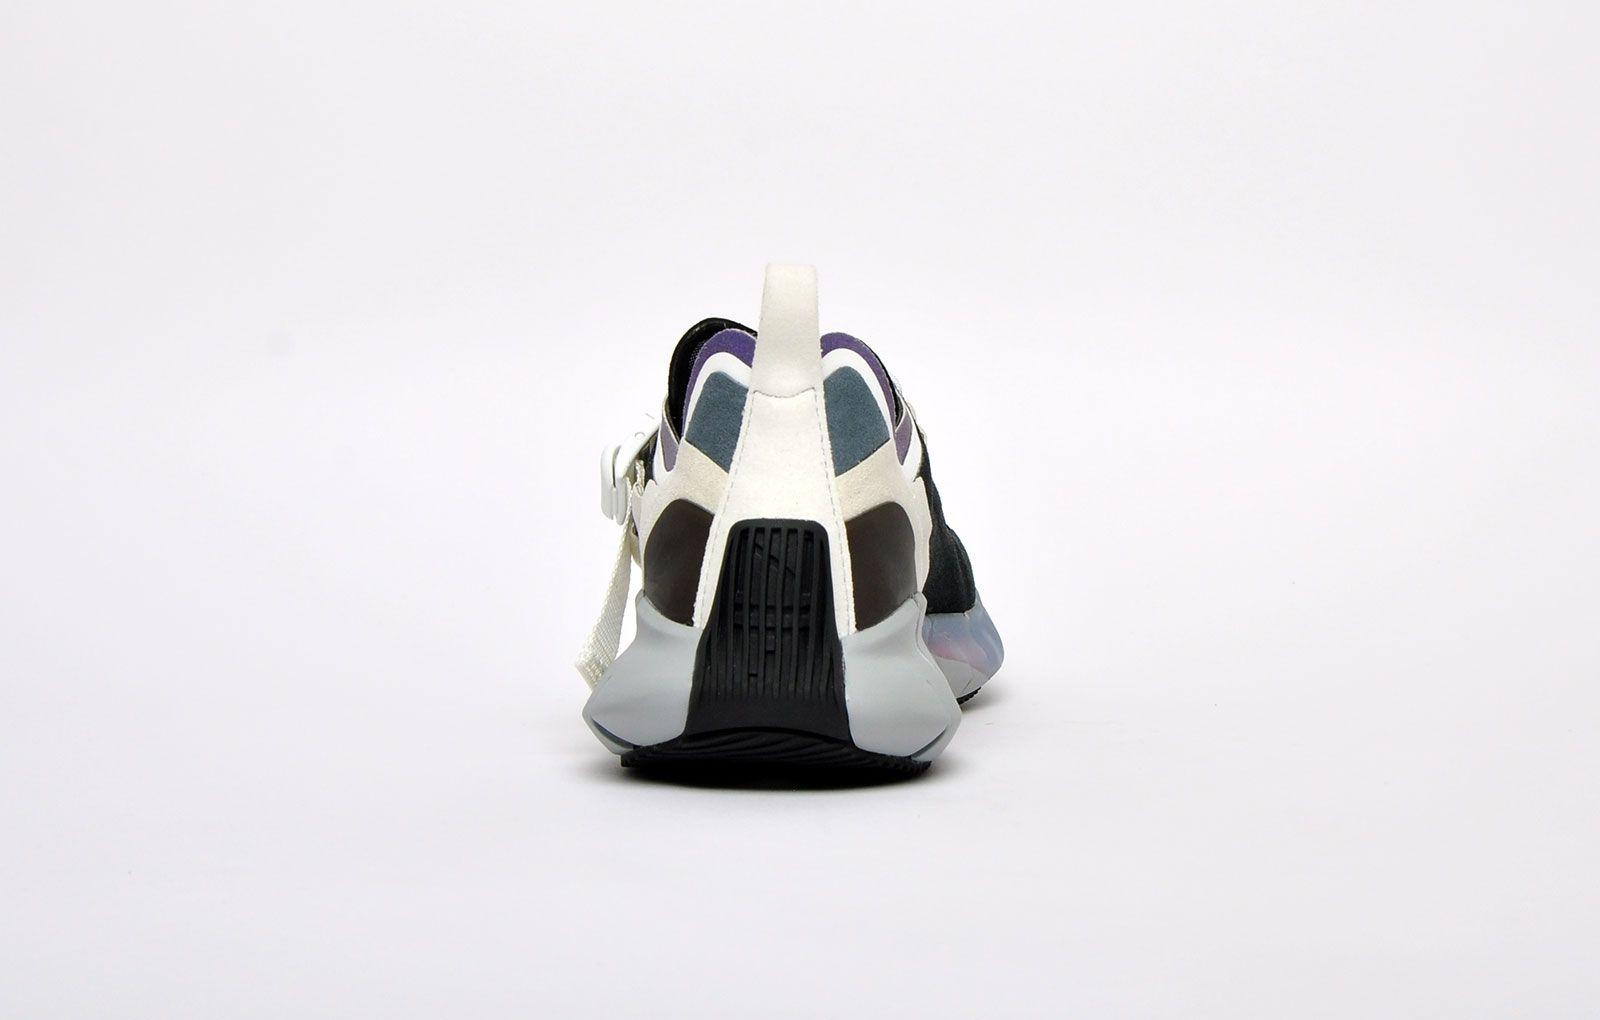 Reebok Zig Kinetica Concept Type 1 Ltd Edition